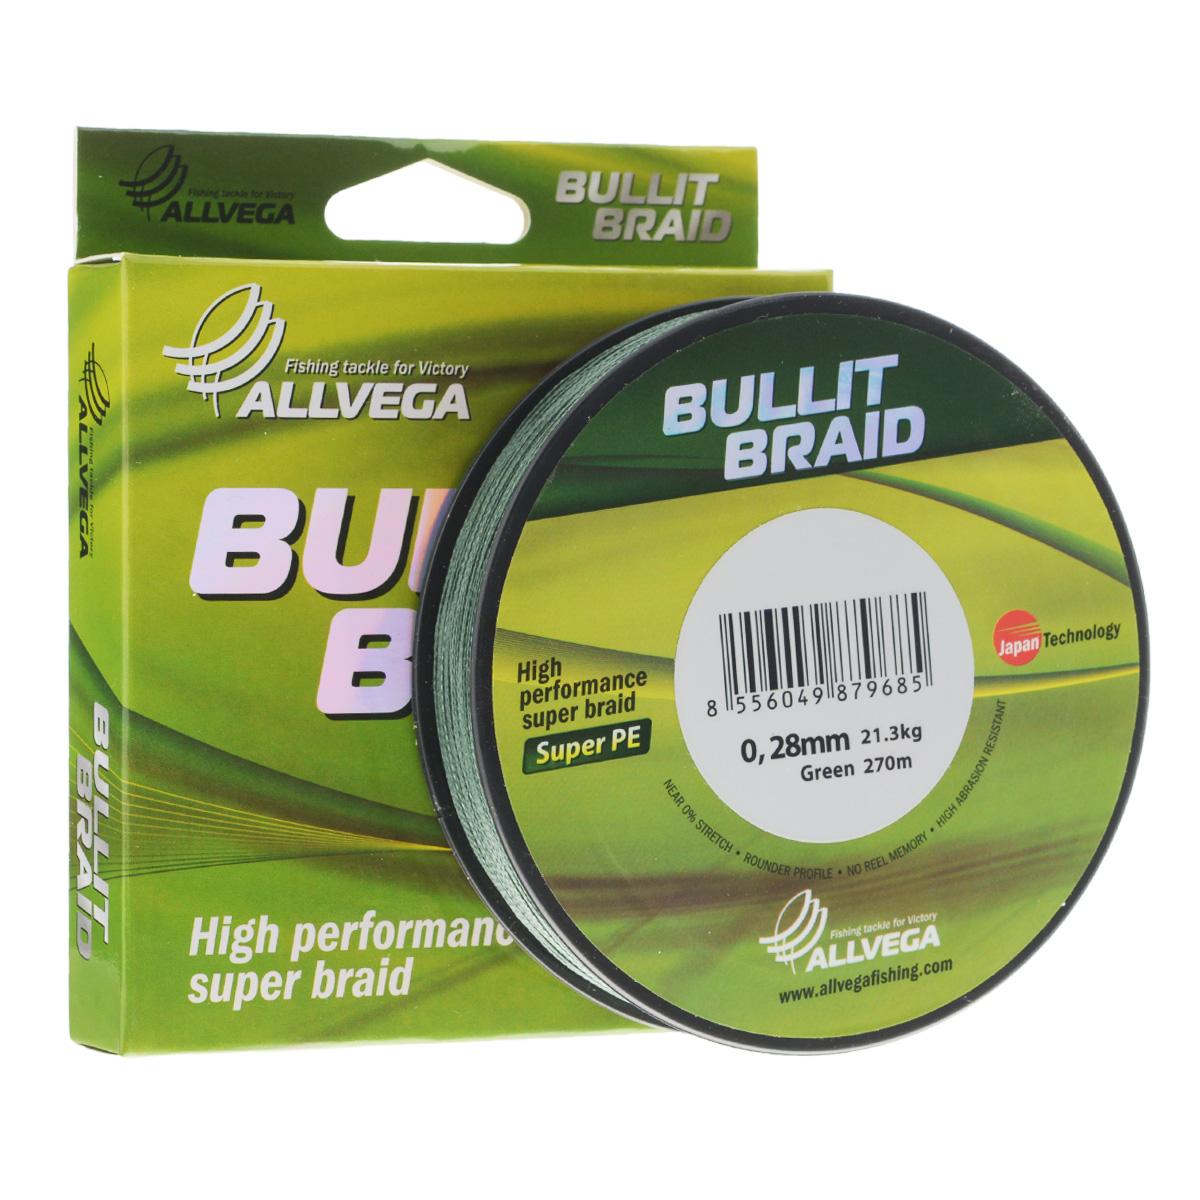 Леска плетеная Allvega Bullit Braid, цвет: темно-зеленый, 270 м, 0,28 мм, 21,3 кг